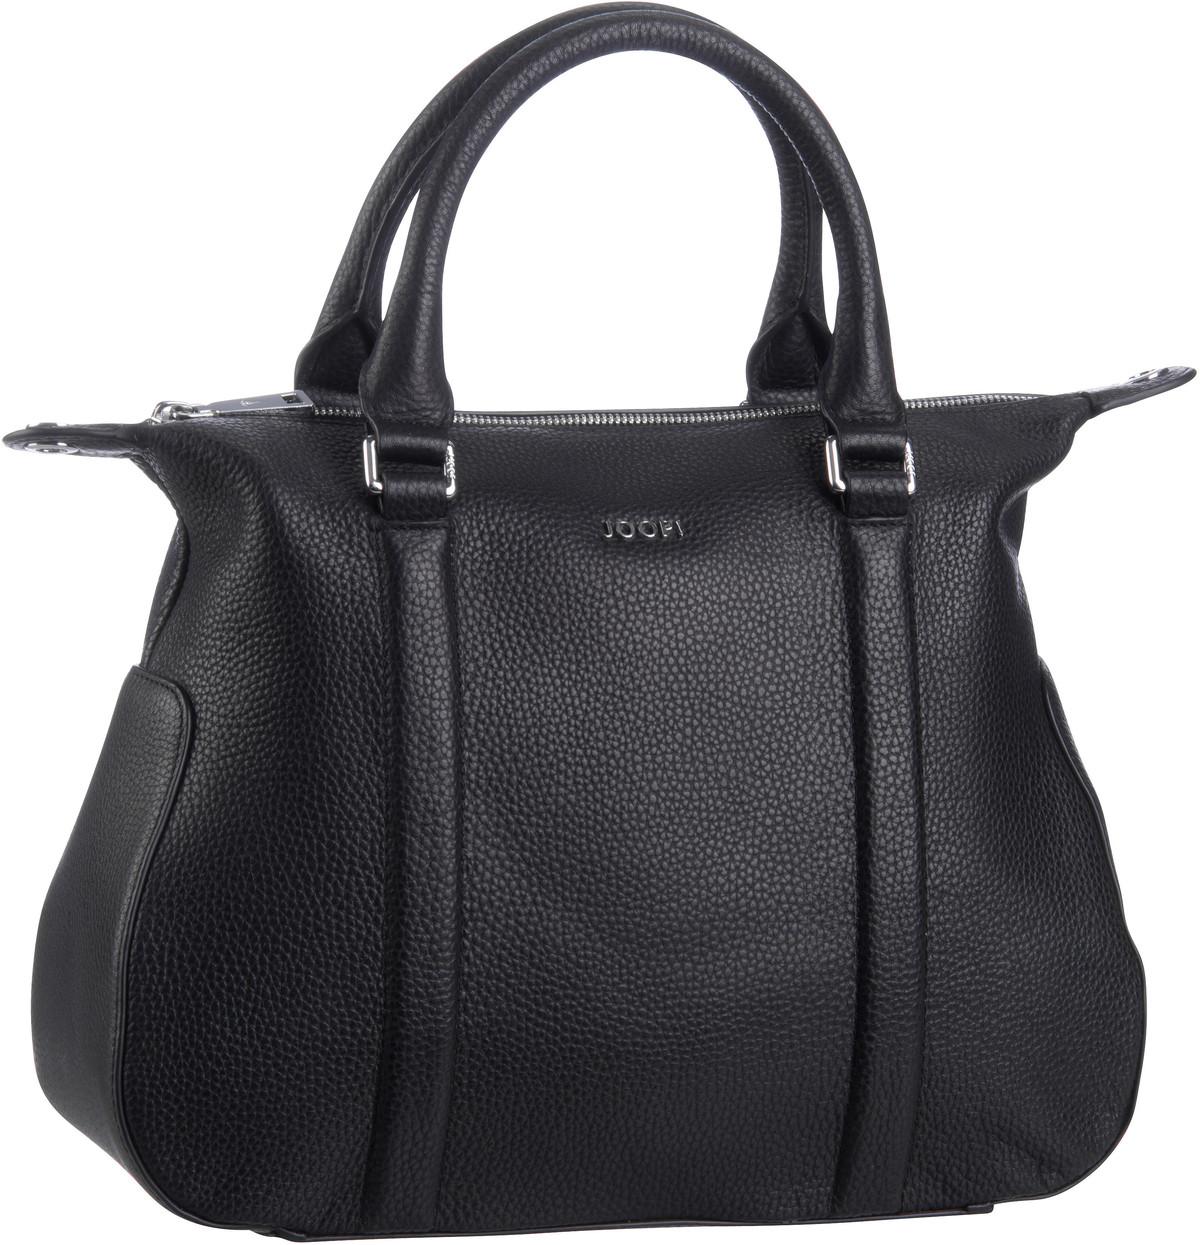 Handtasche Felicita Medea HandBag MHZ Black